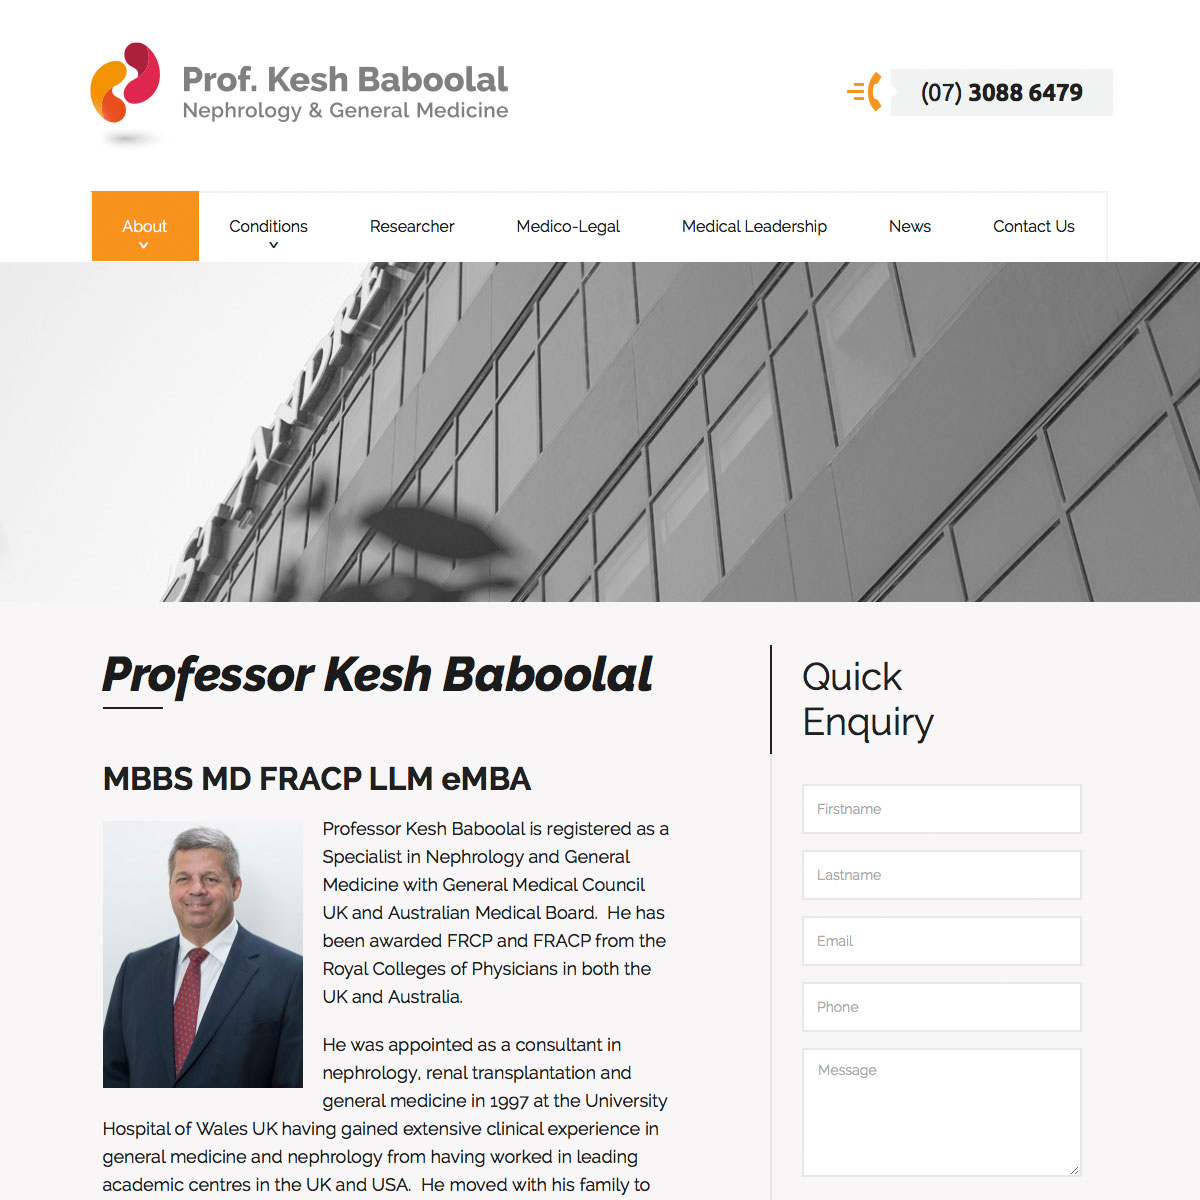 Professor Keshwar Baboolal - BIO